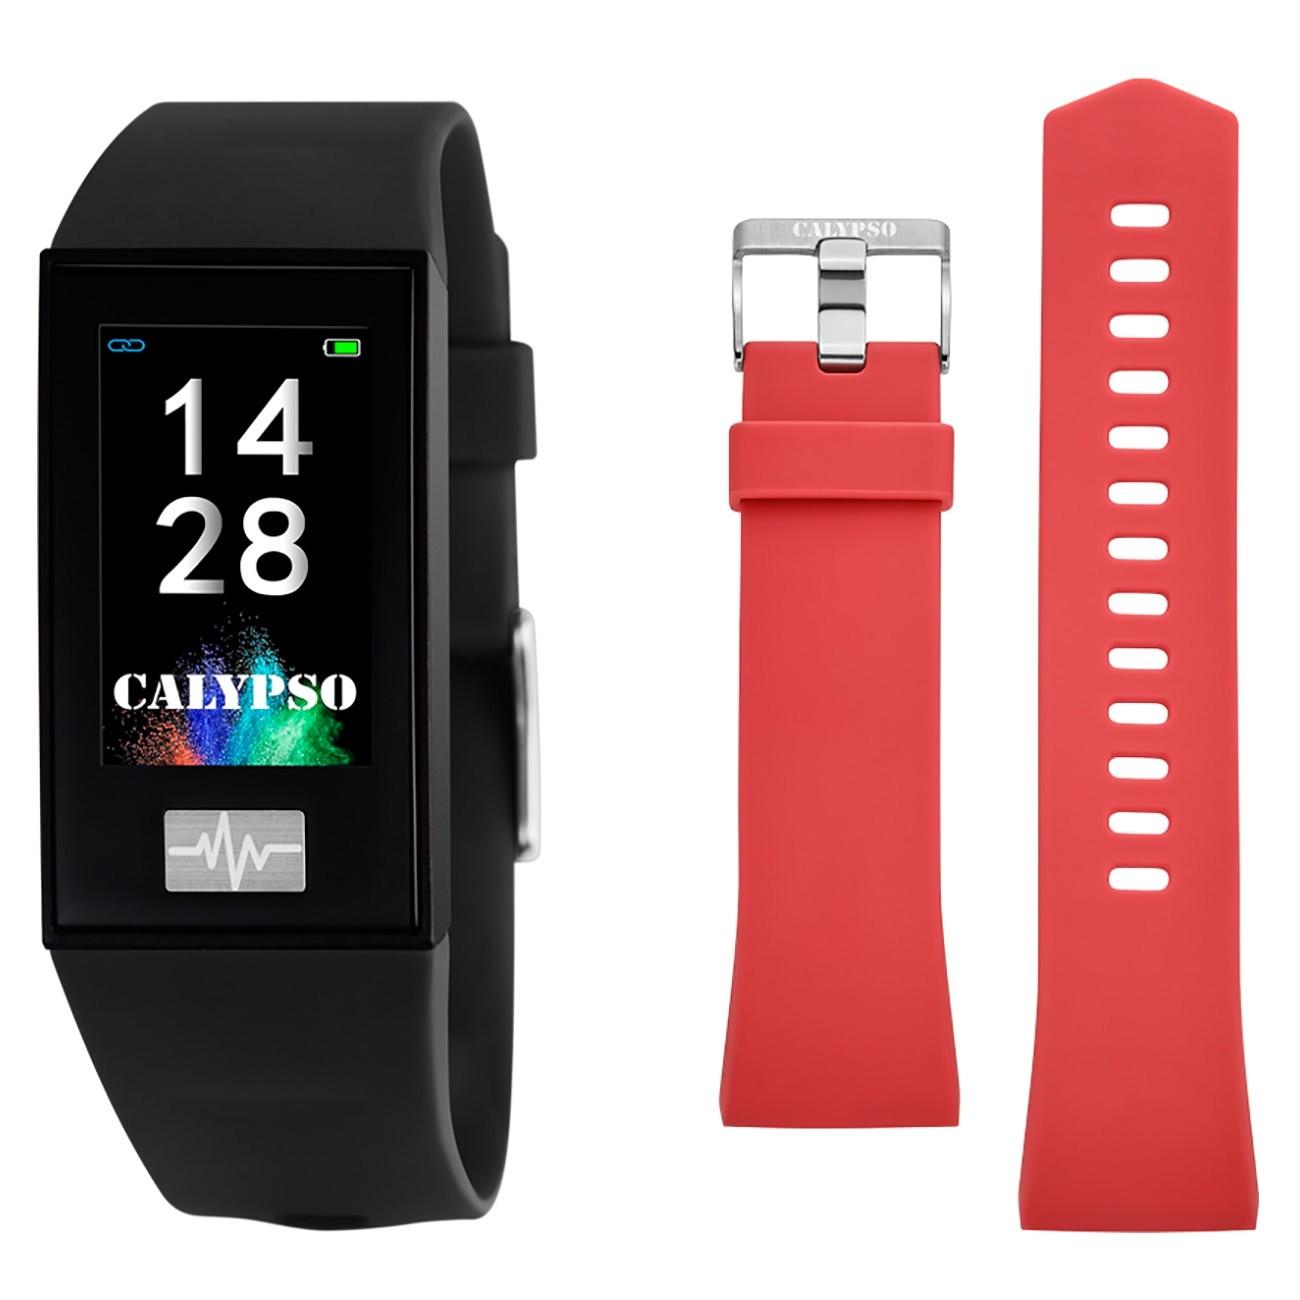 Calypso Fitness Tracker Smartime K8500-6 Smartwatch schwarz, rot TCK8500-6